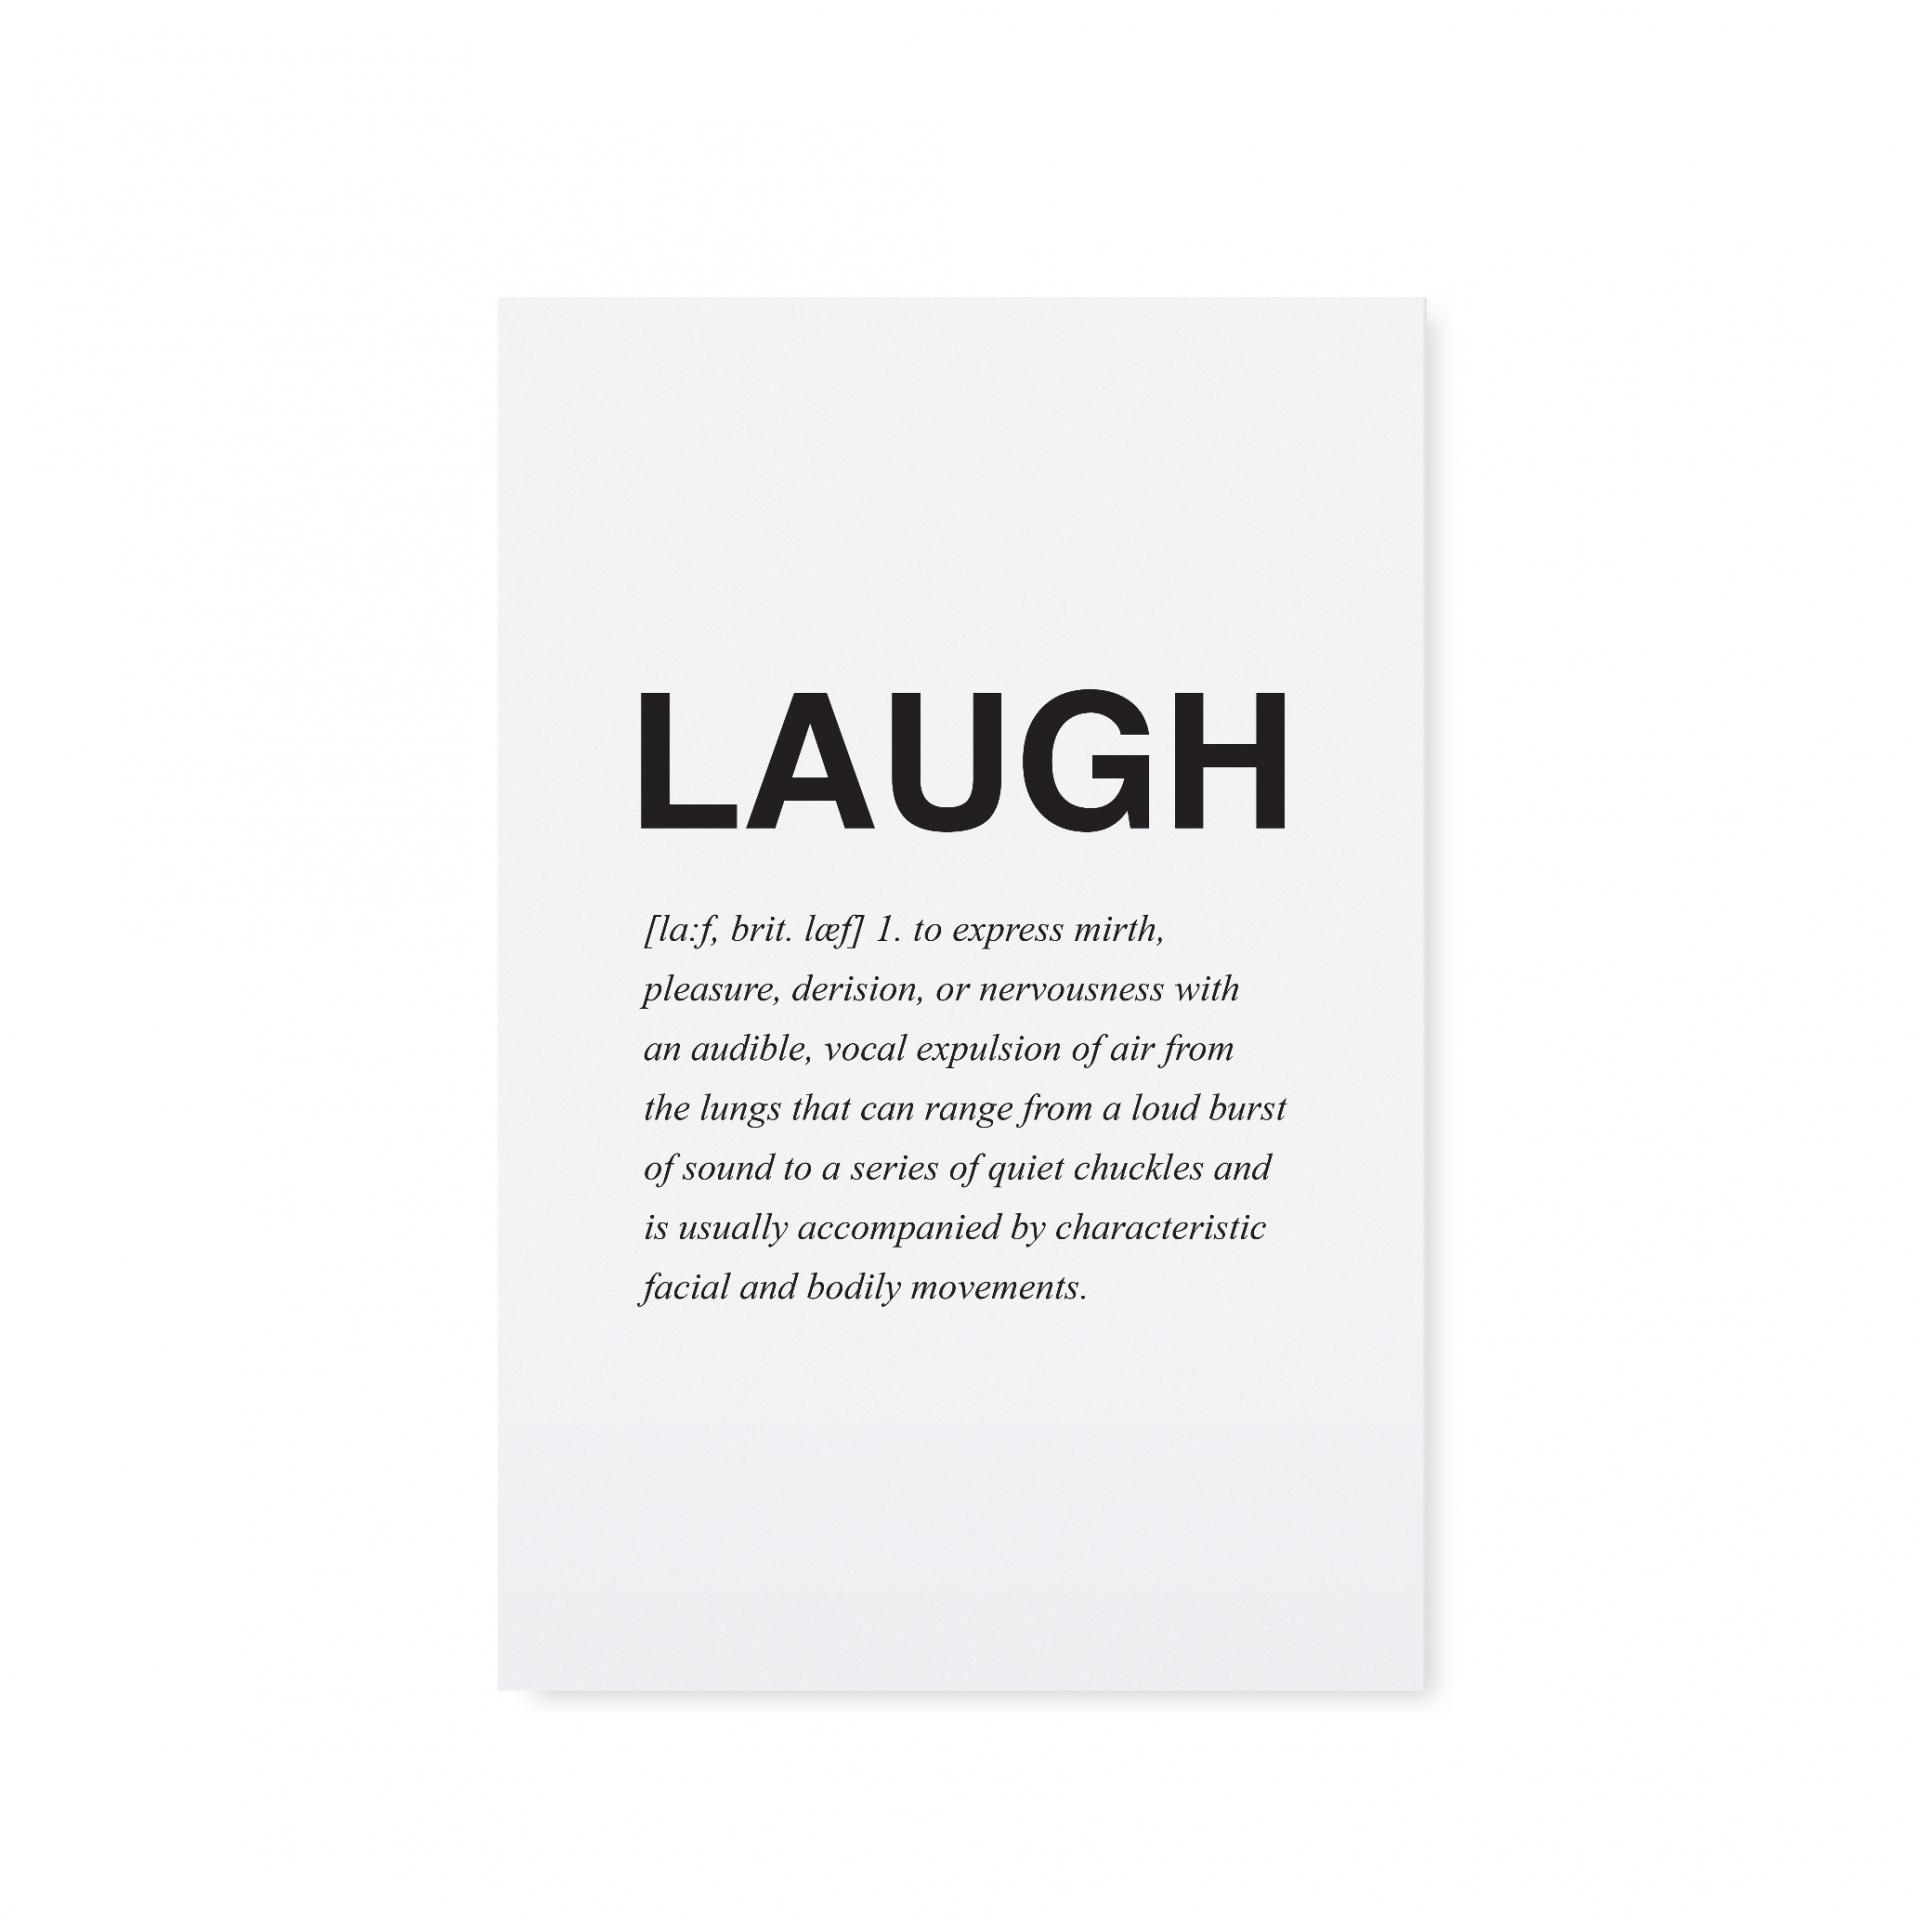 TAFELGUT Pohlednice Laugh, černá barva, bílá barva, papír